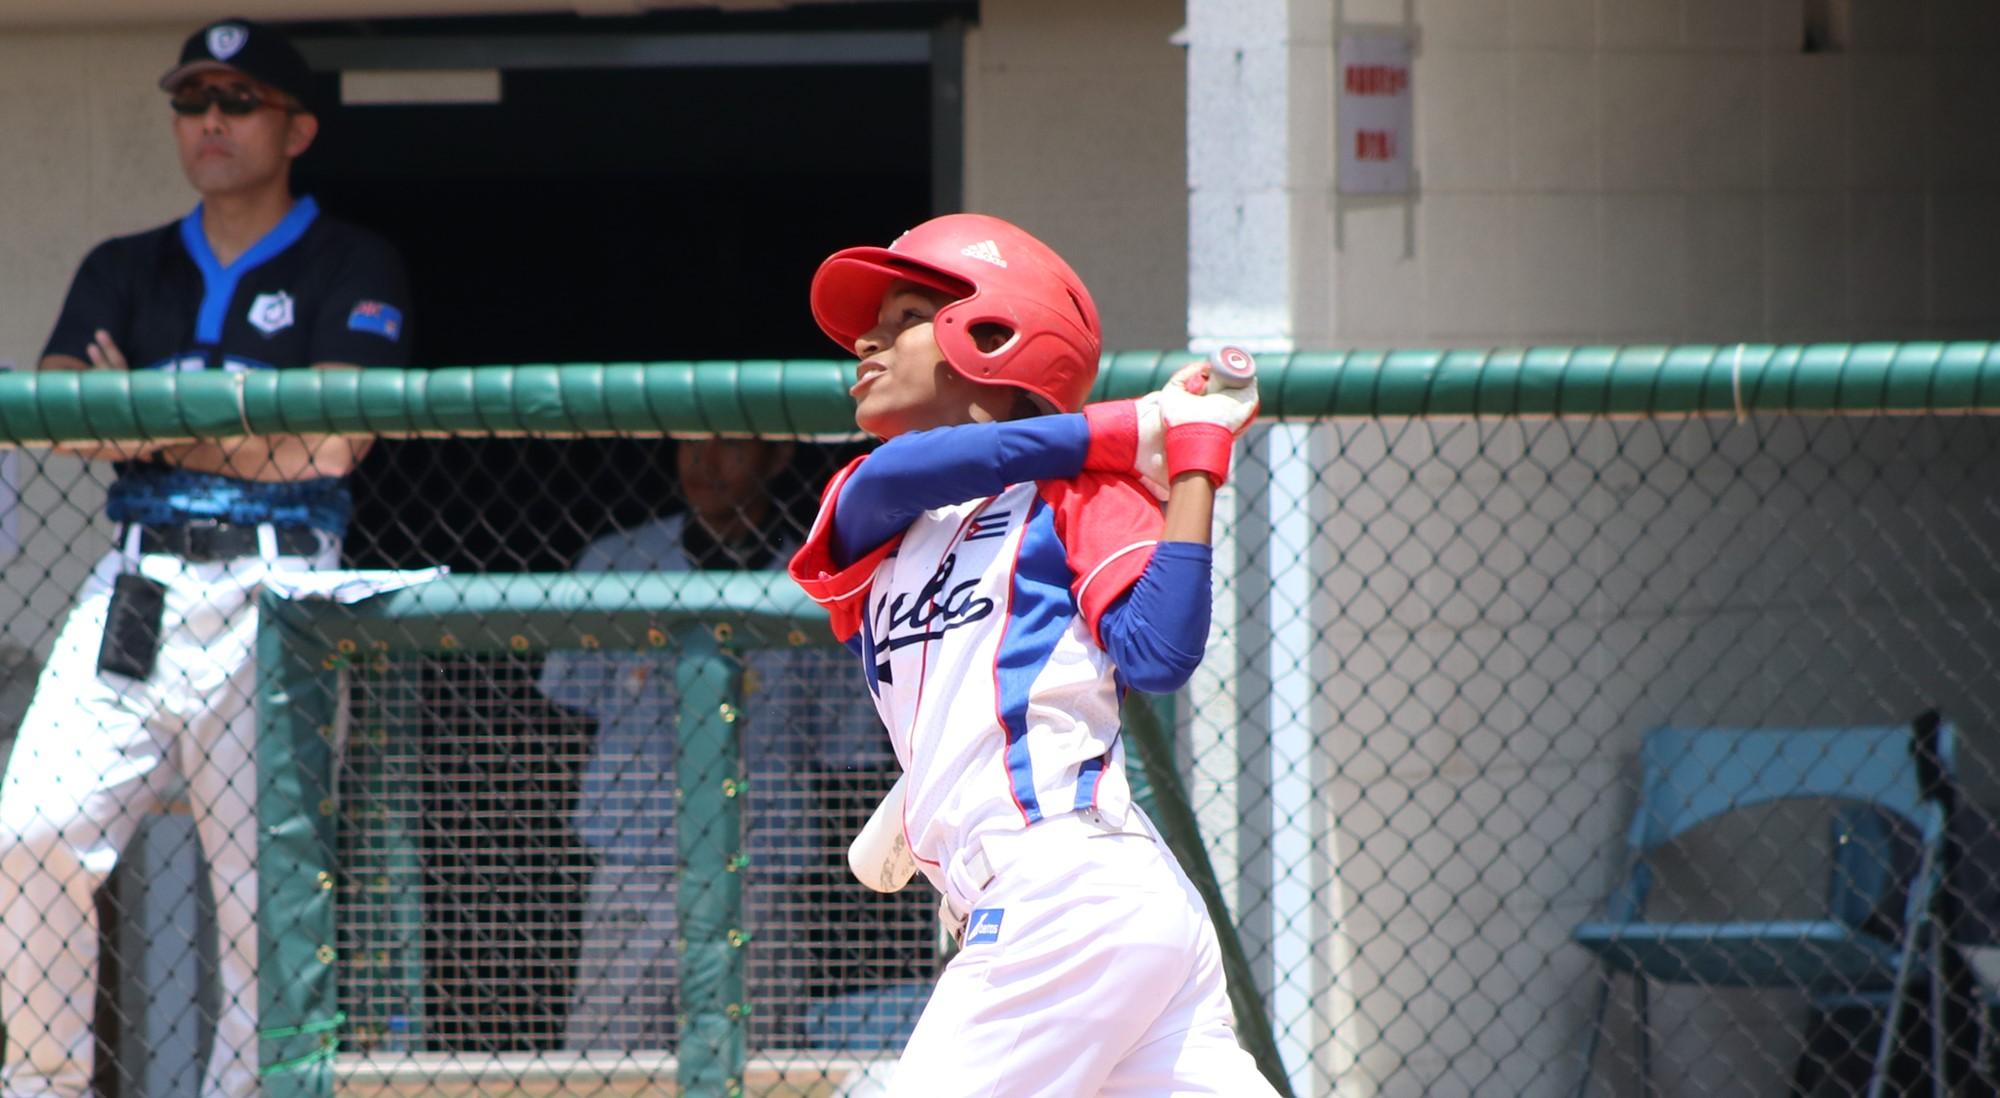 Cuba scored 27 runs on 23 hits, including a home run